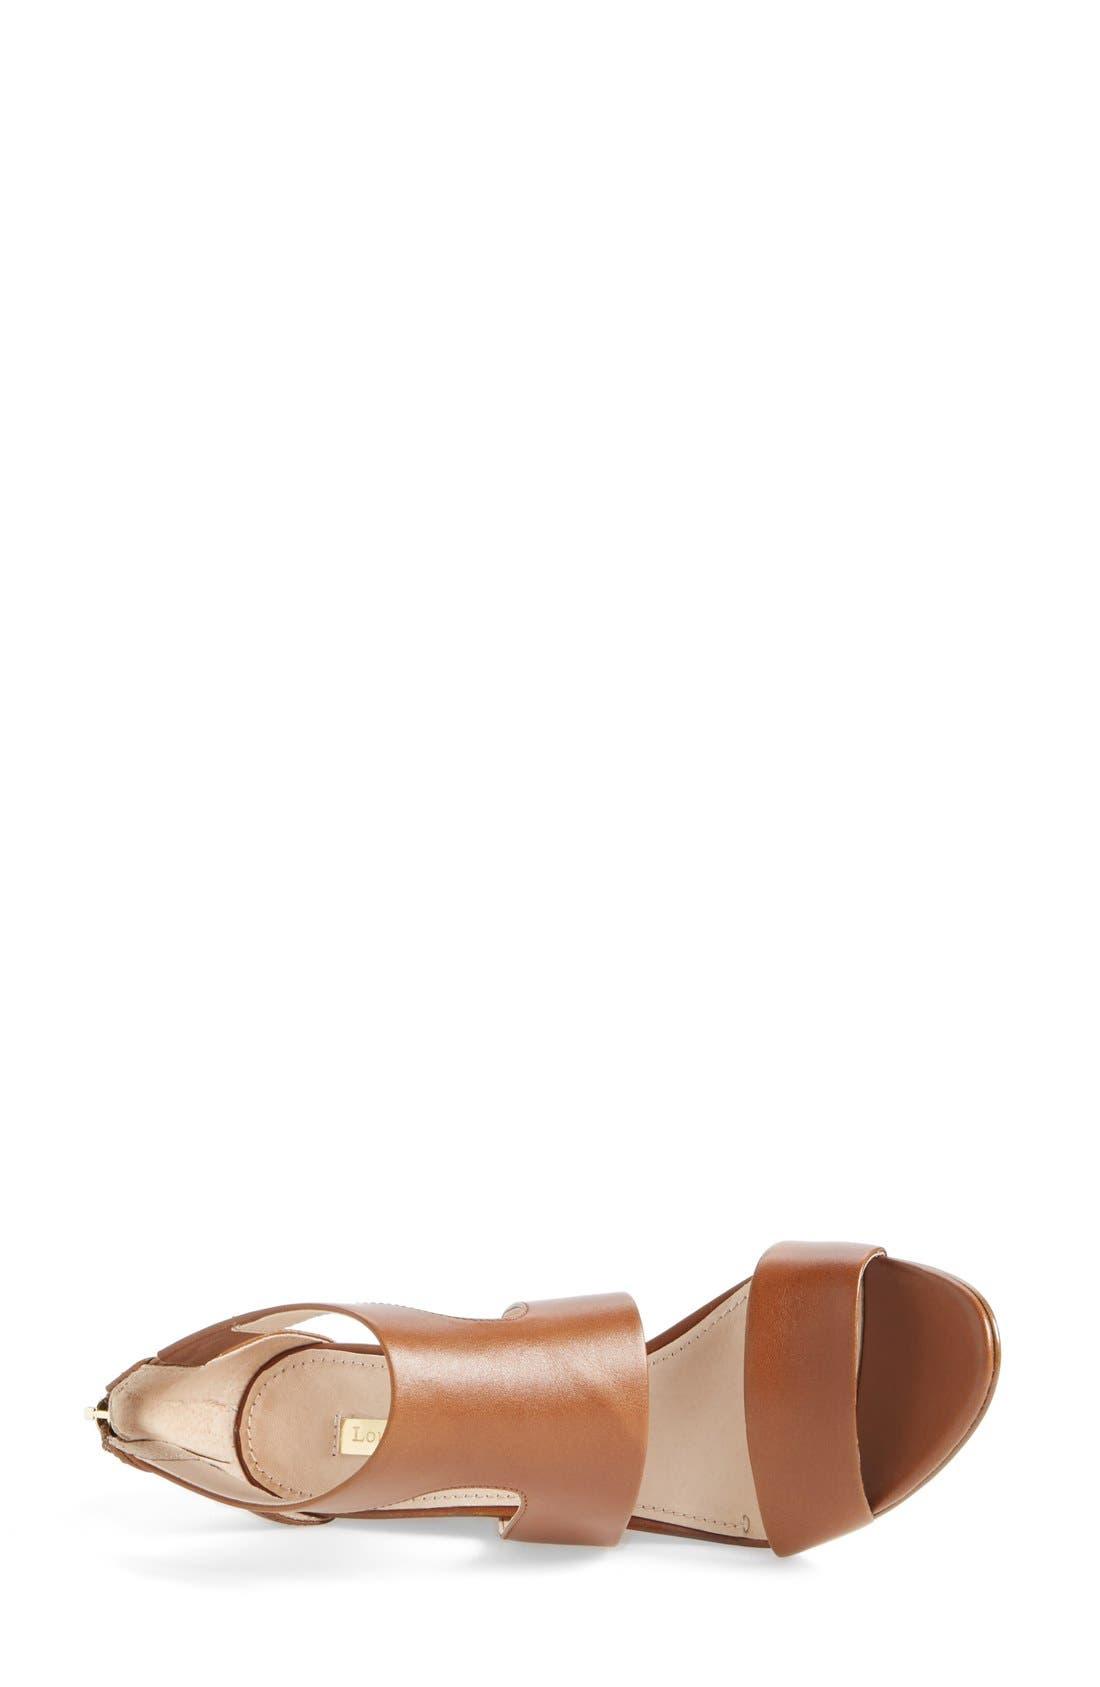 Alternate Image 3  - Louise et Cie 'Rozza' Leather Wedge Sandal (Women)